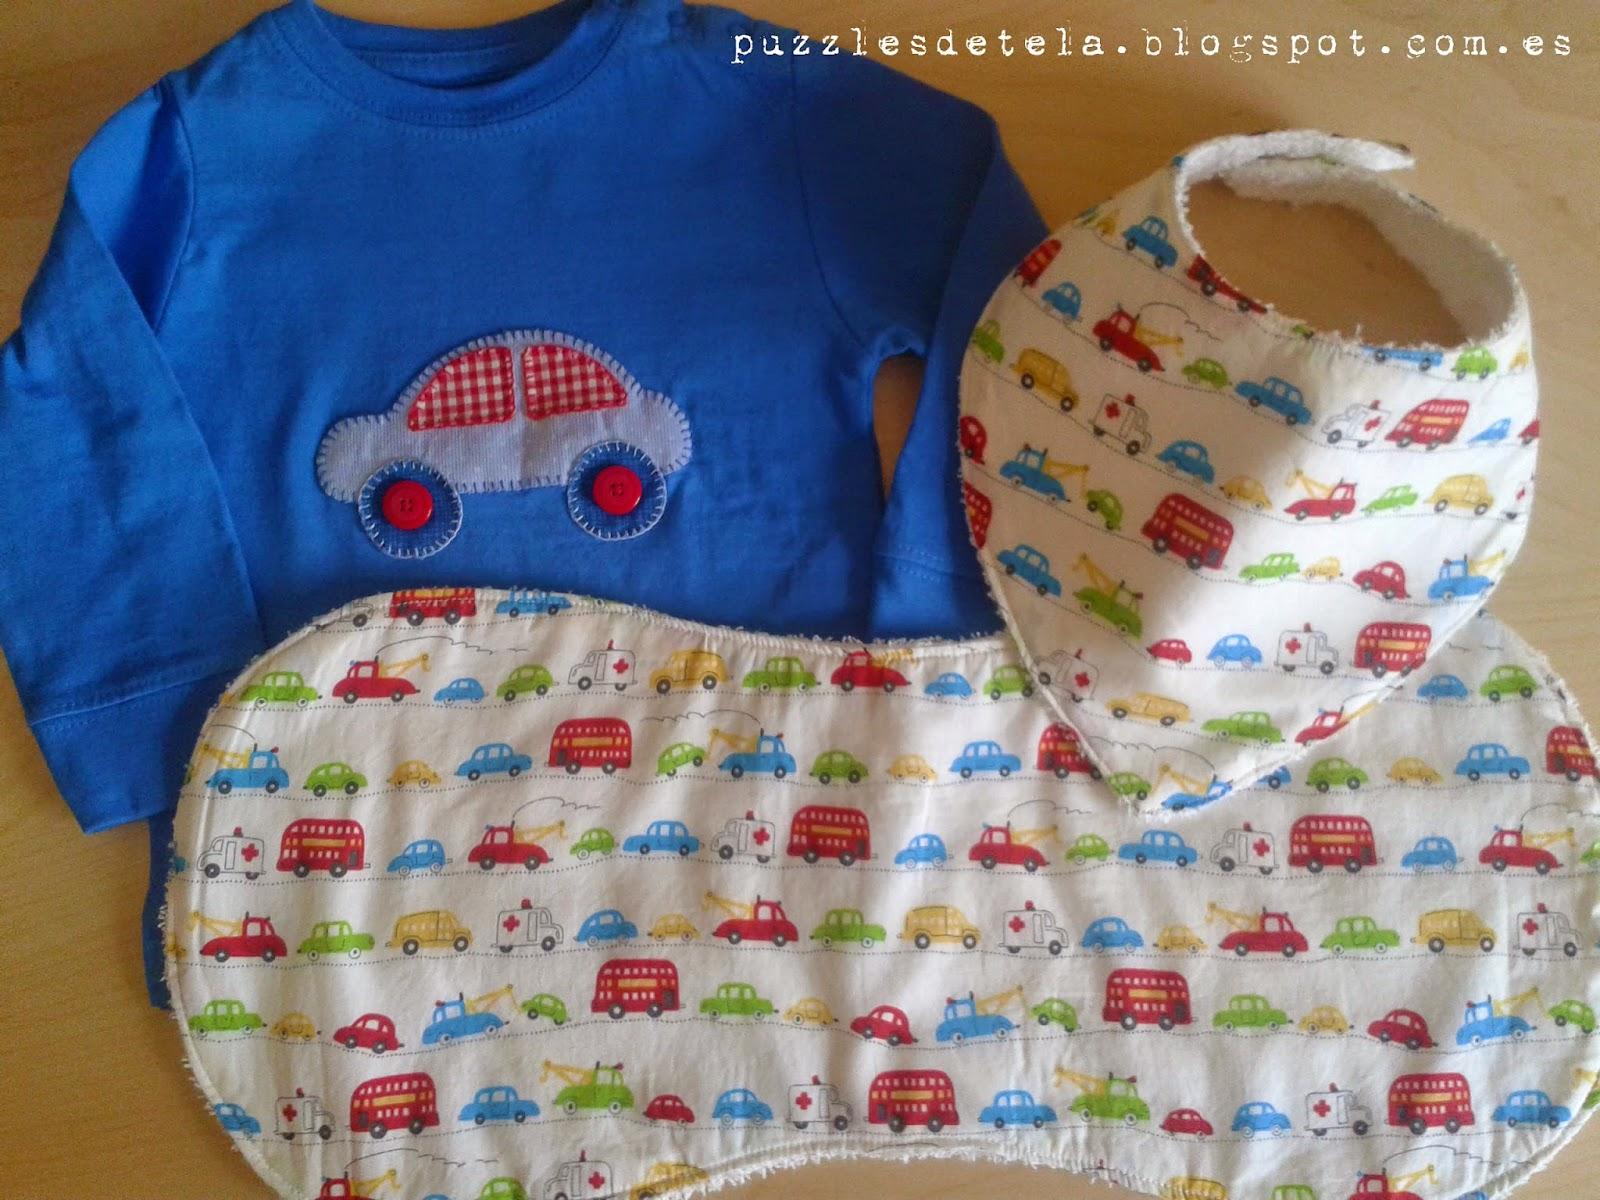 Puzzles de tela, regalos para bebés, babero bandolera, toalla de lactancia, patchwork, camiseta coche, camiseta patchwork,  hecho a mano, handmade